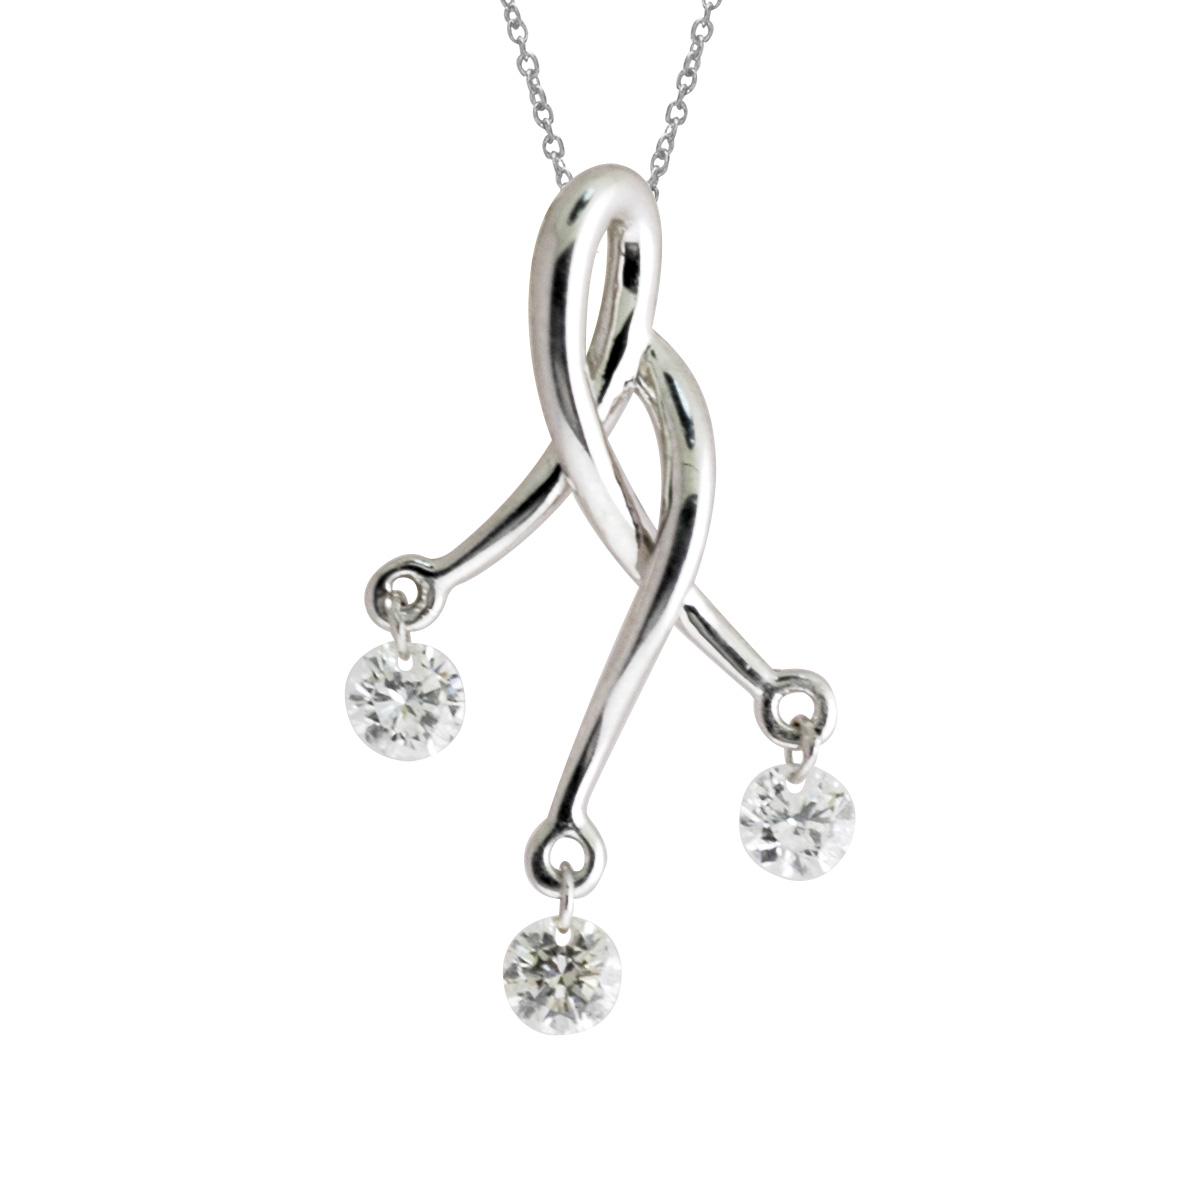 14k gold Dashinng Diamonds pendant with 0.24 total ct diamonds. The center dangling diamond dance...